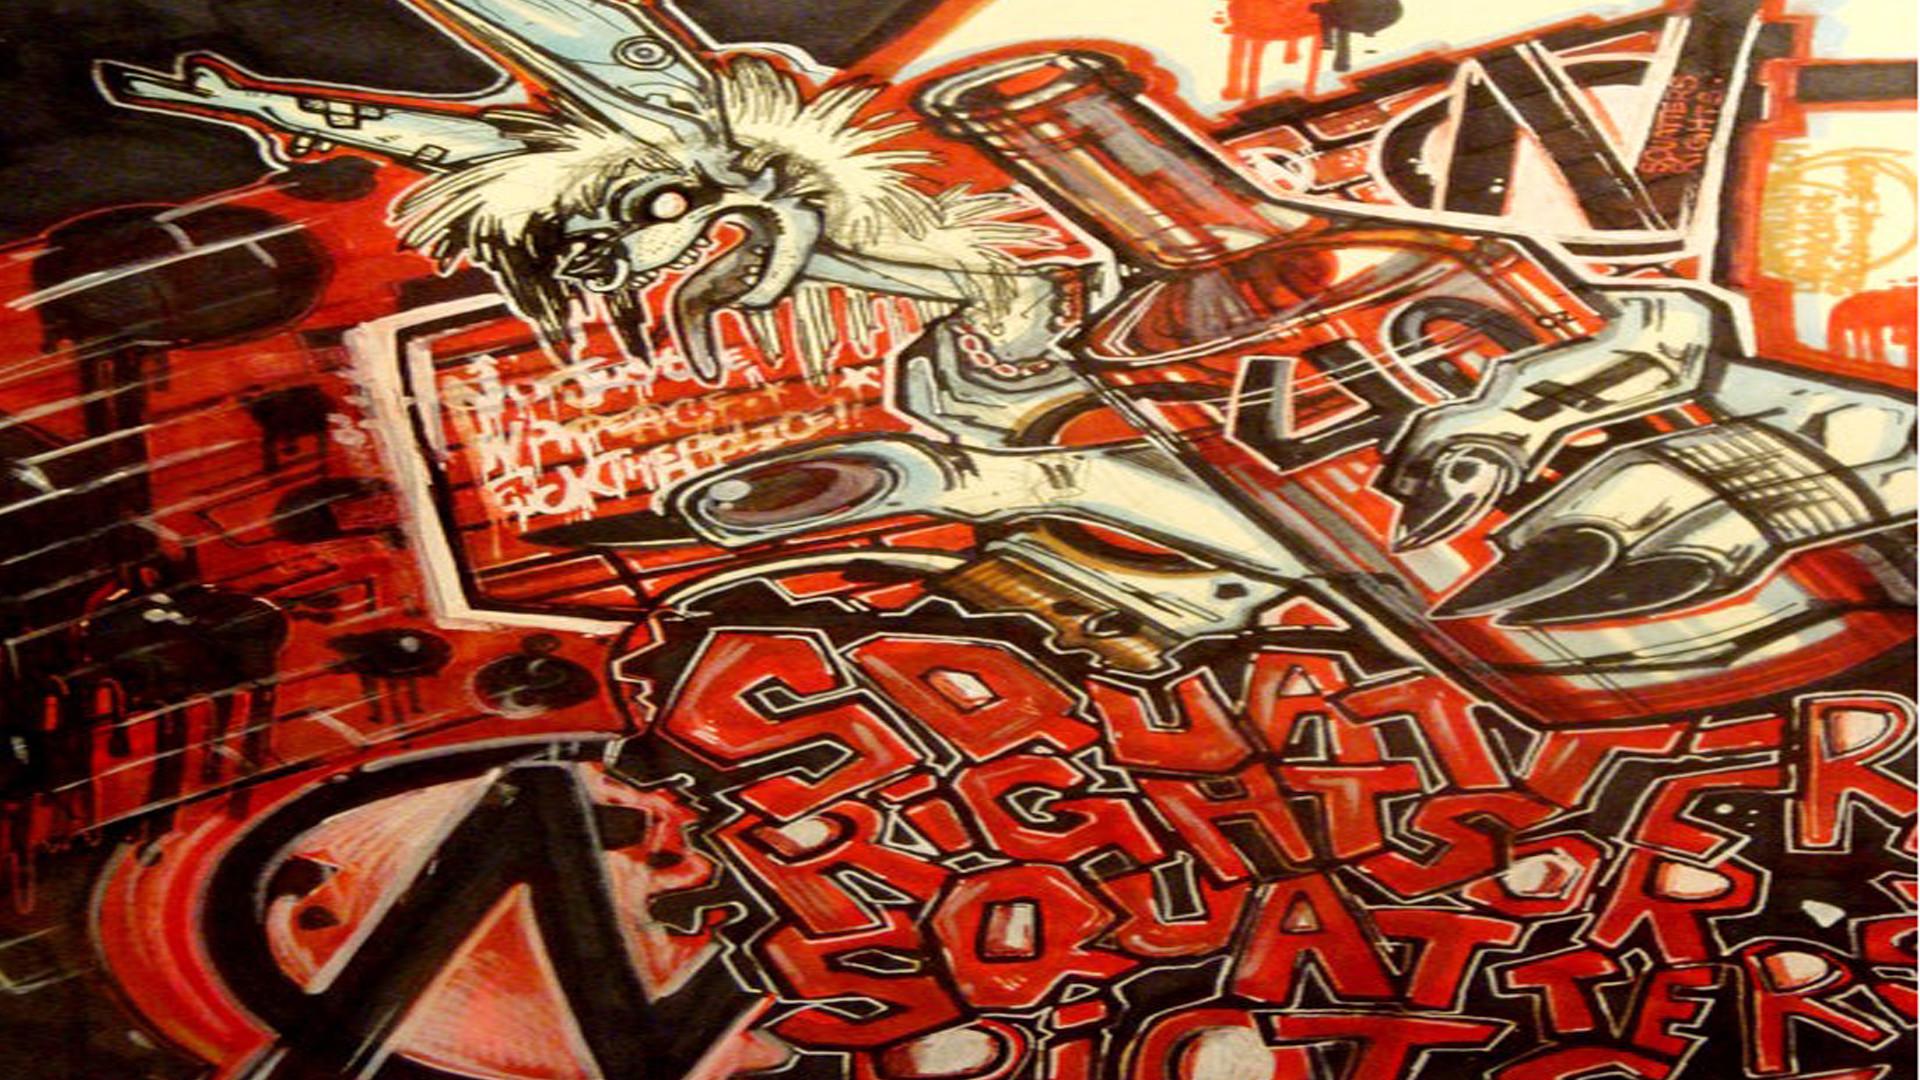 Joker Quotes Wallpaper Hd 1080p Red Graffiti Wallpaper 62 Images